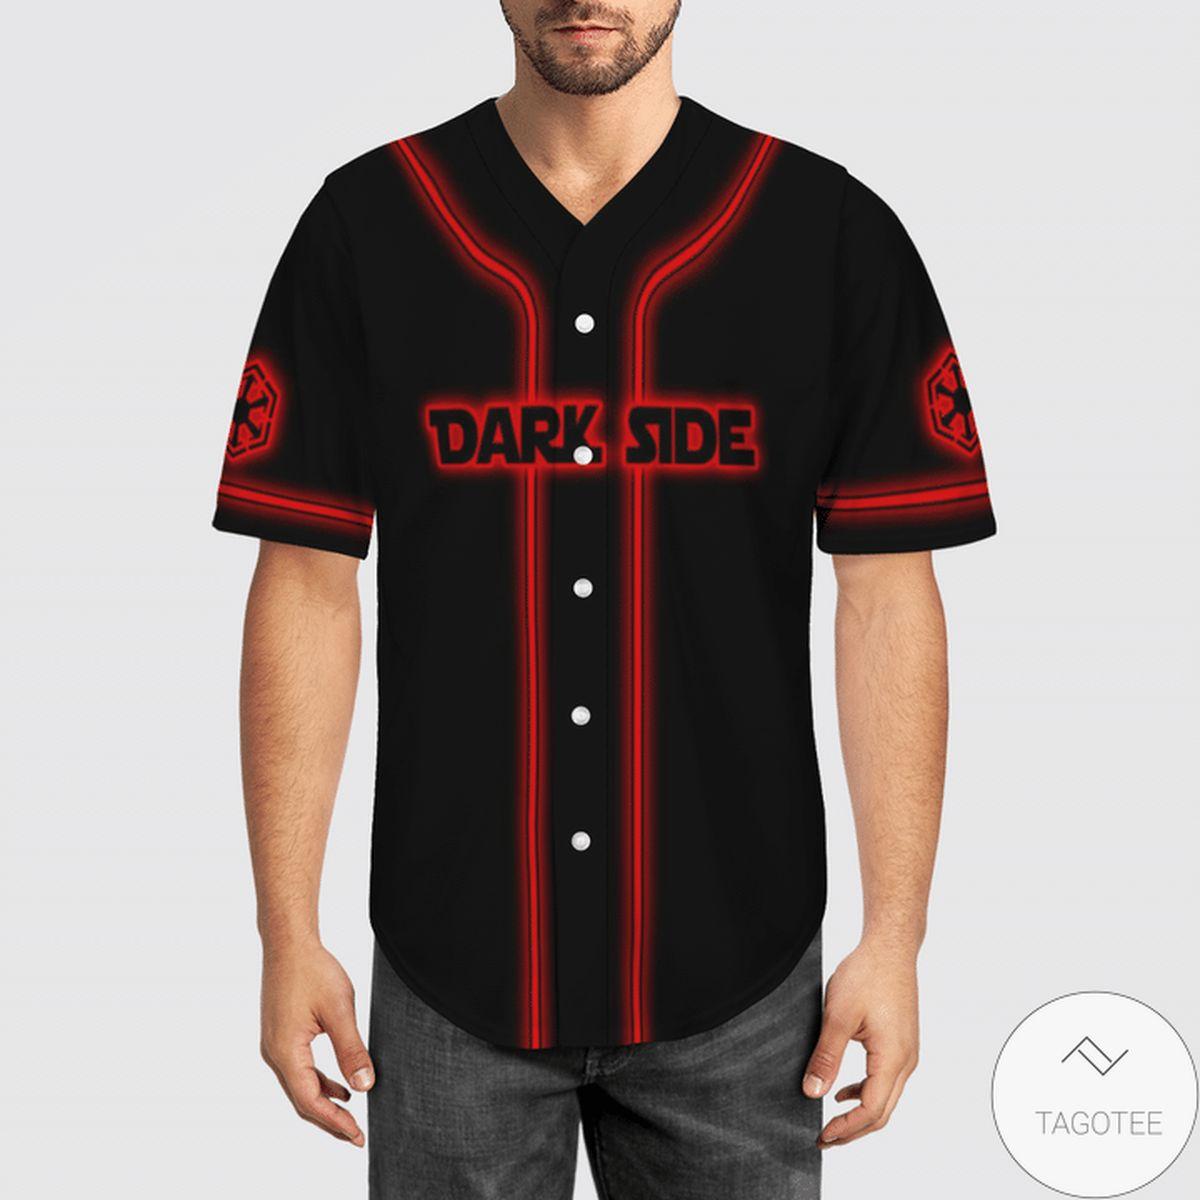 Funny Tee Star Wars Dark Side Baseball Jersey